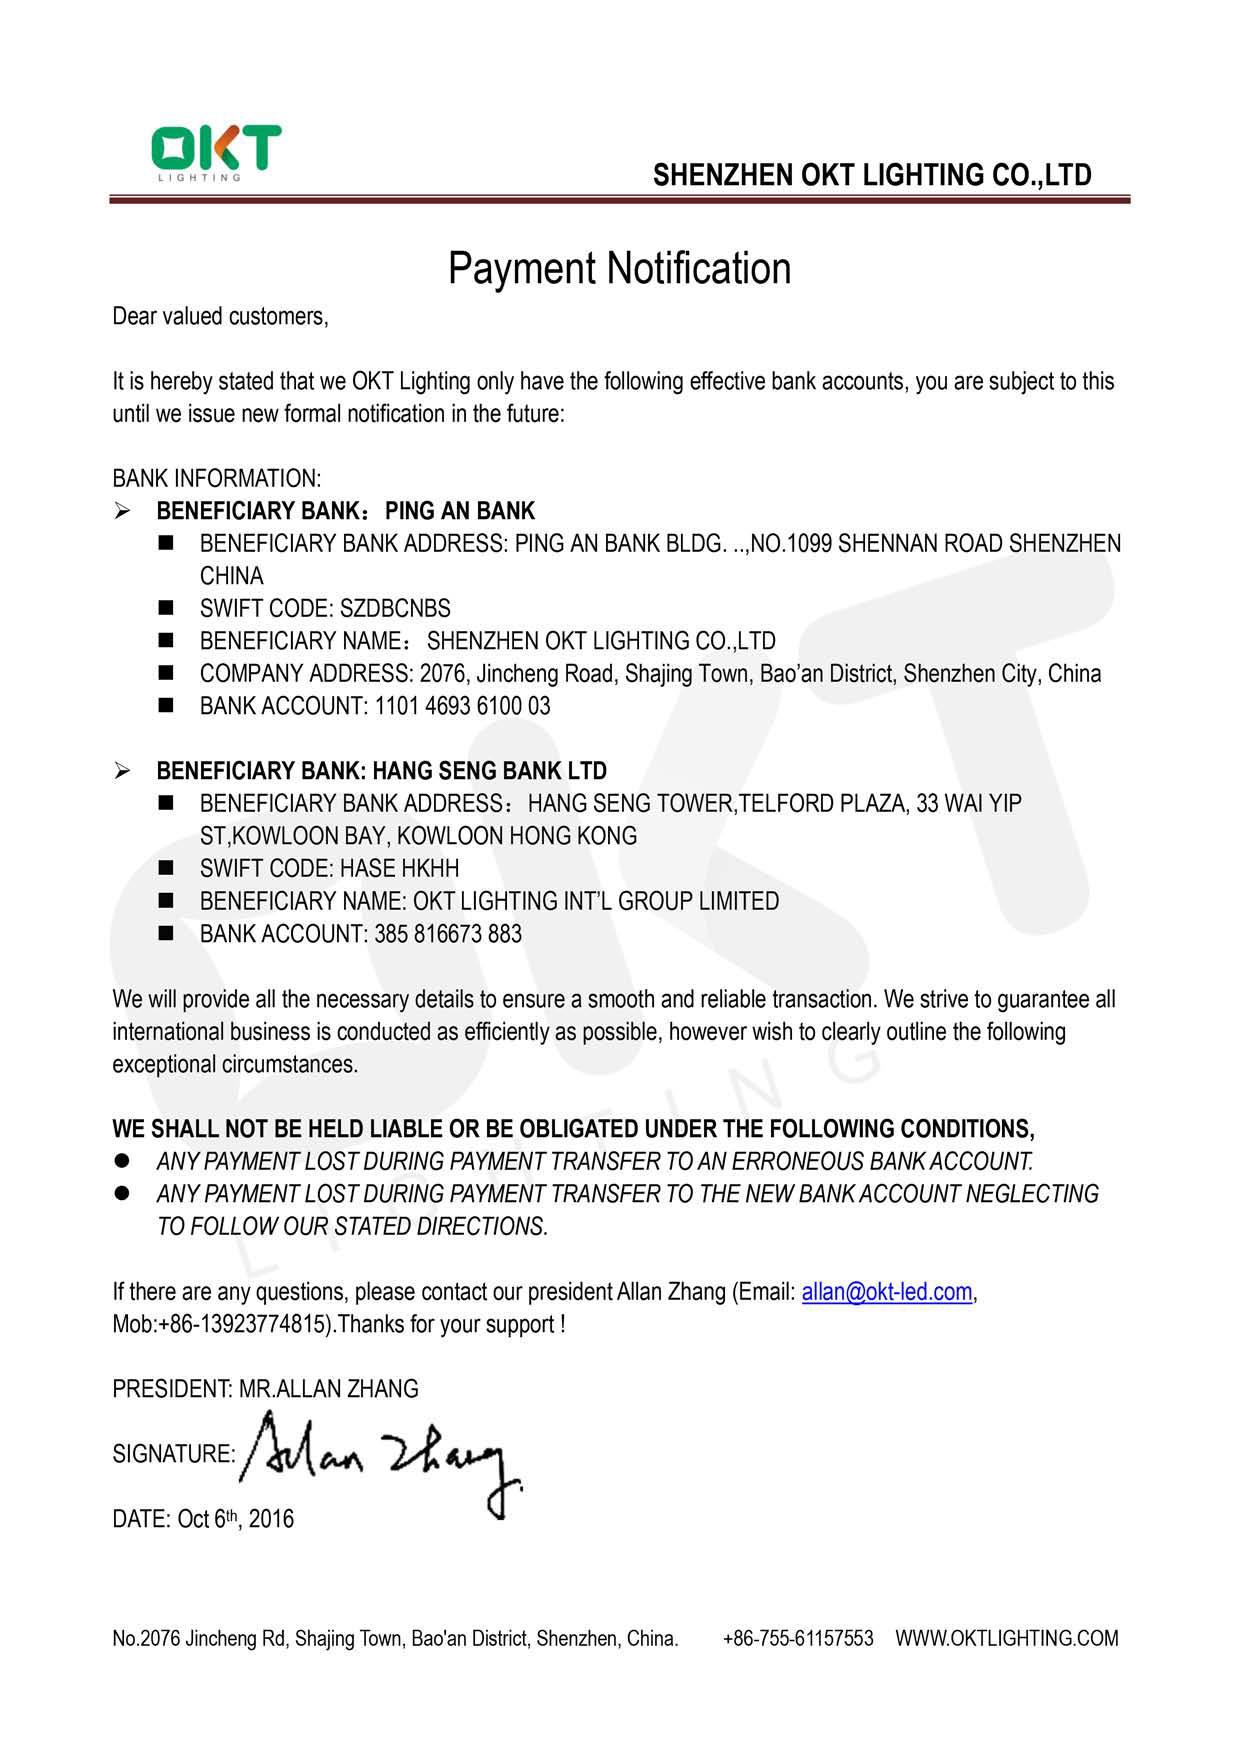 OKT Lighting Payment Notification